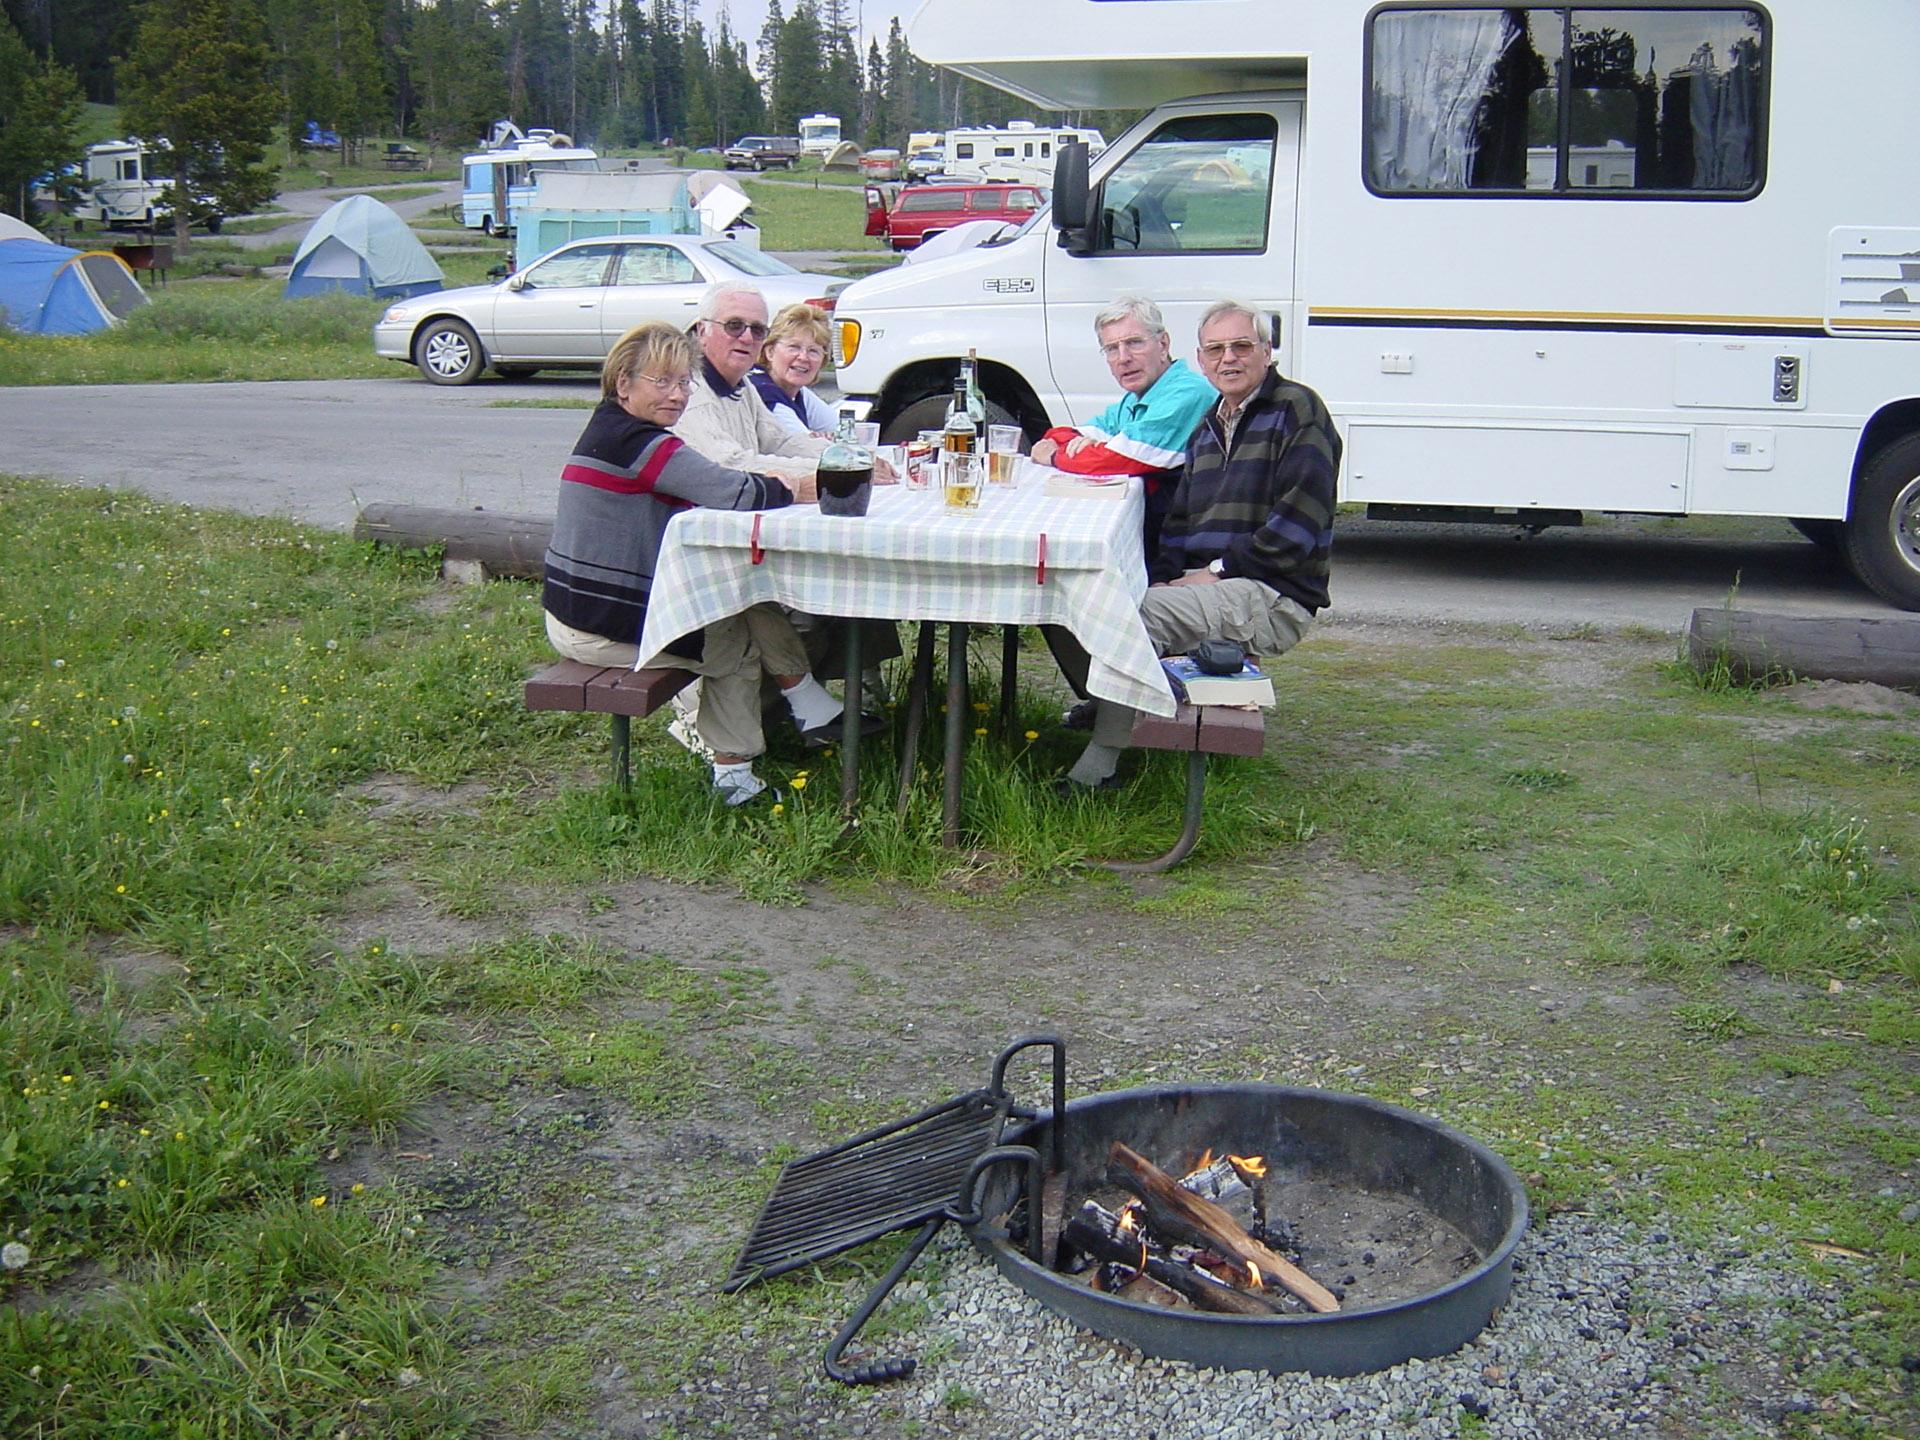 Campground Bridge Bay